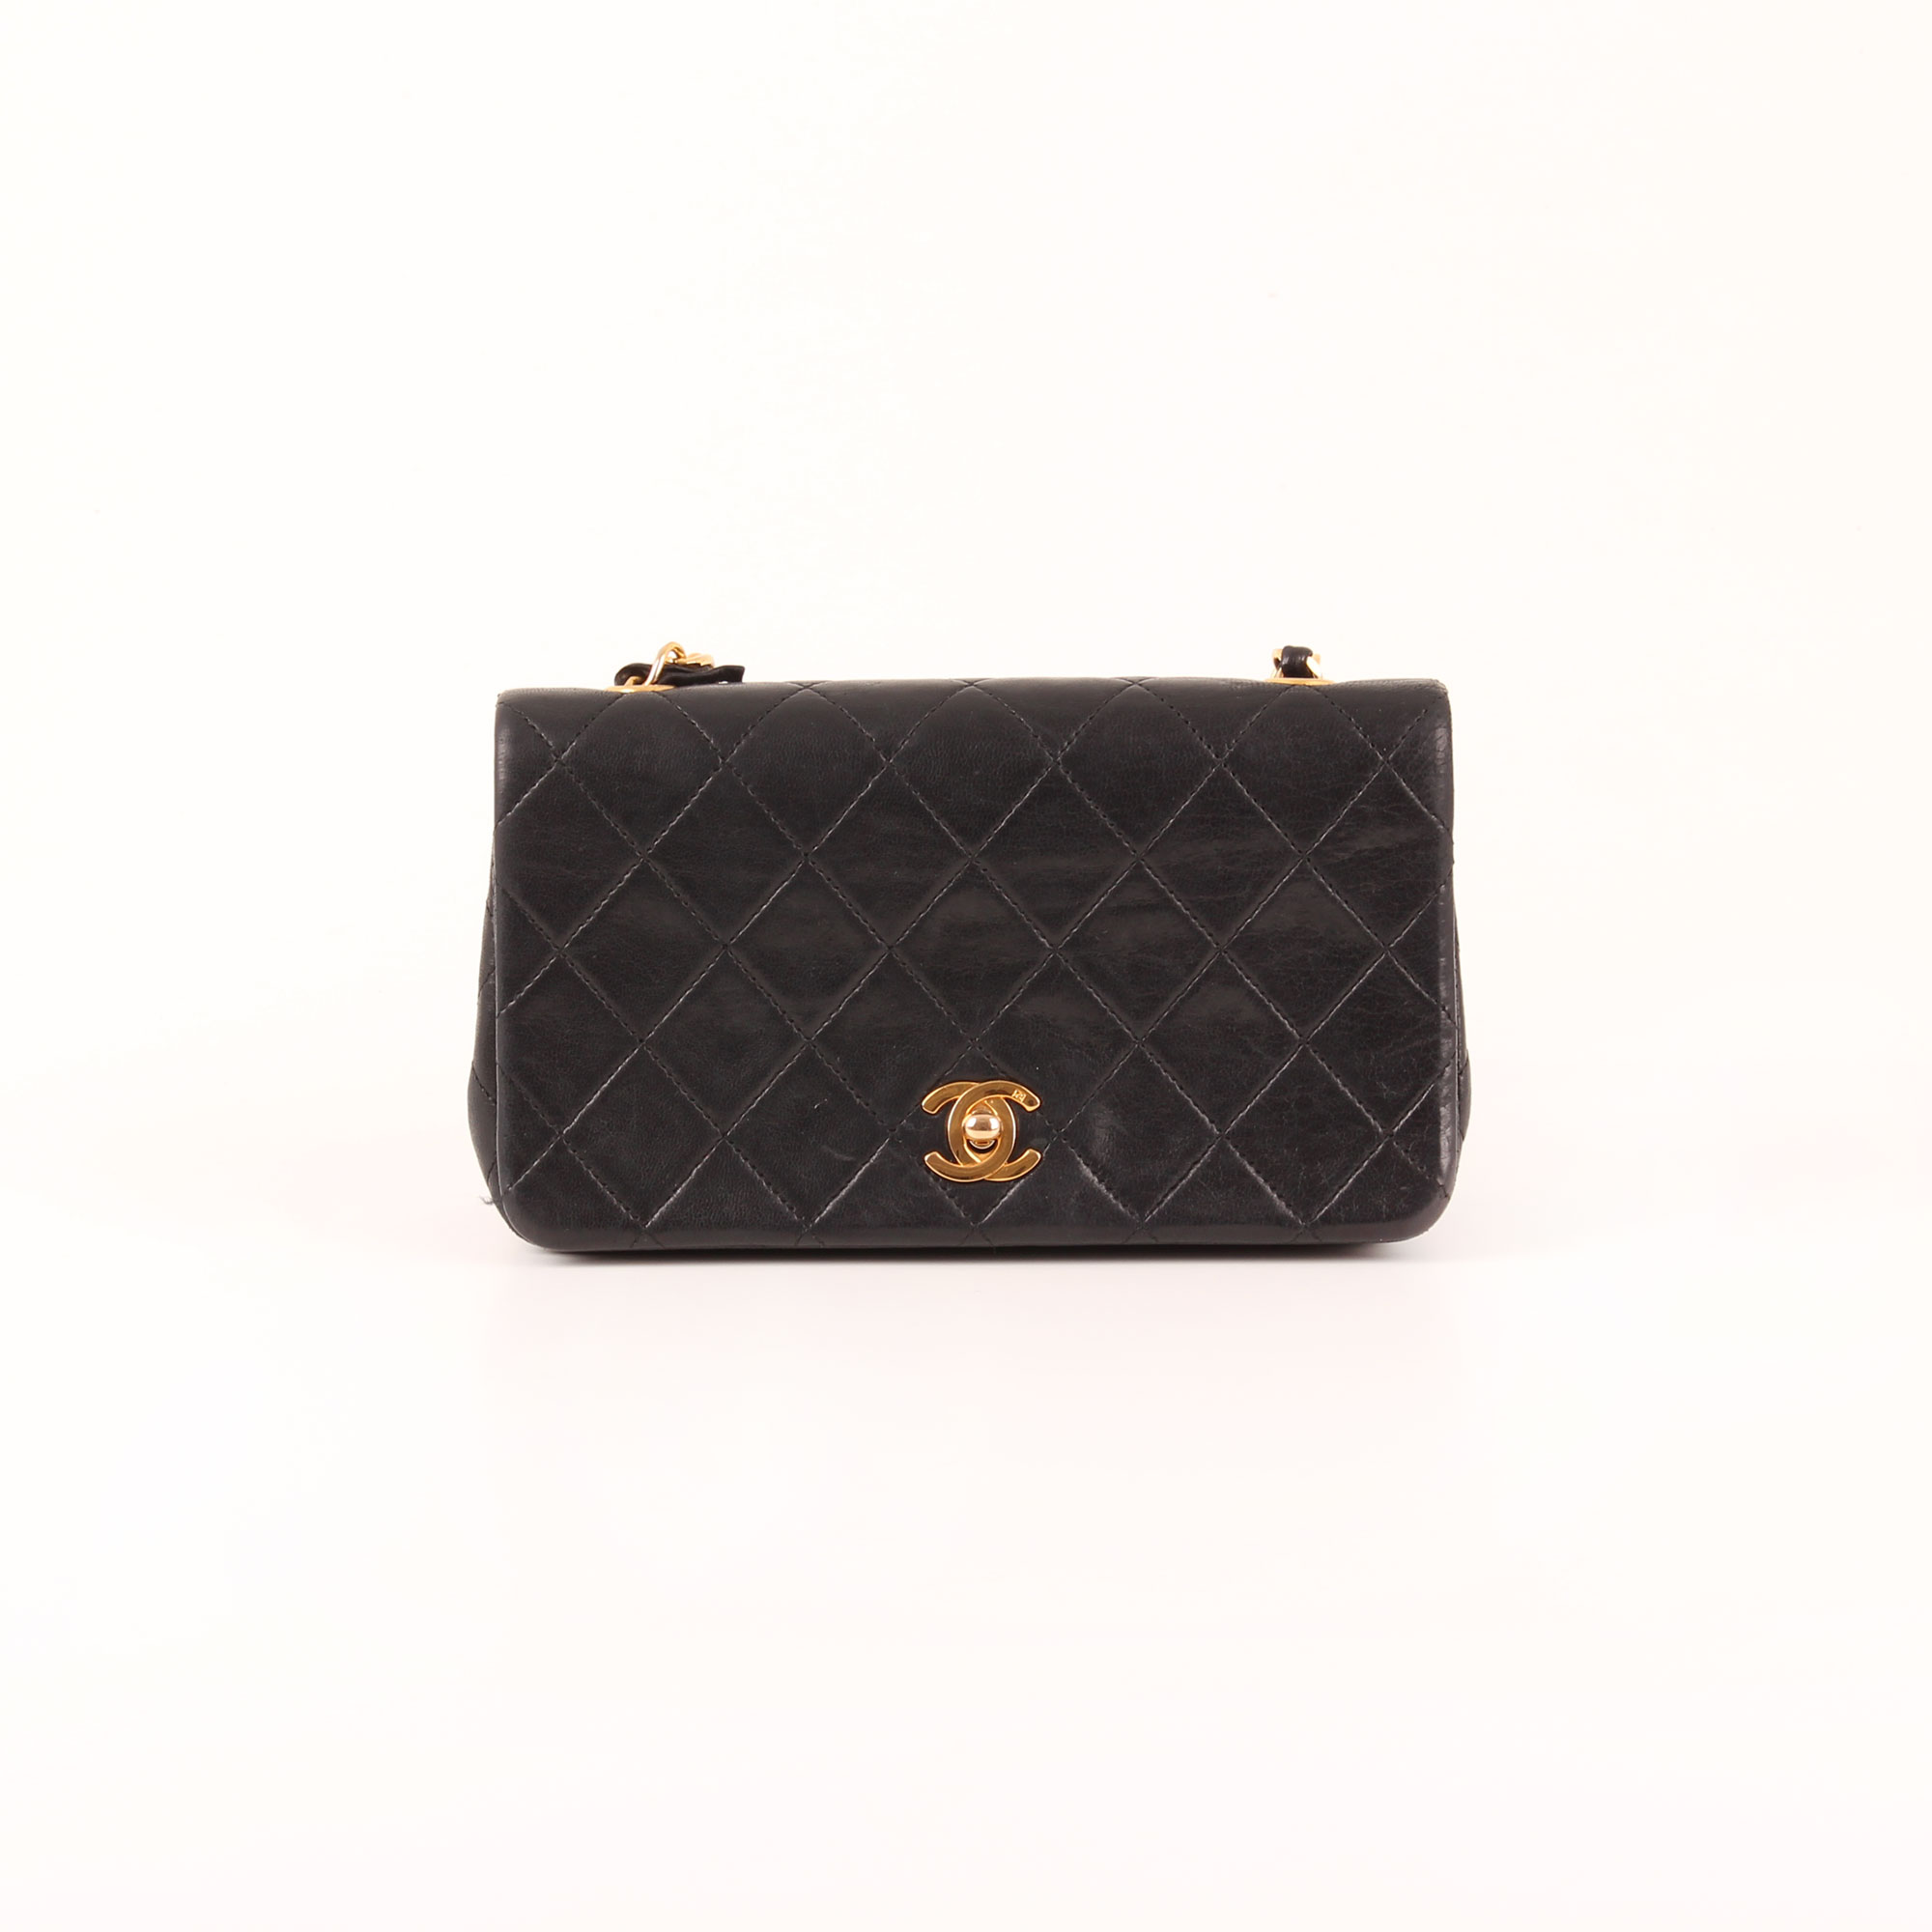 88c7bb077 Imagen frontal del bolso Chanel Timeless Vintage Flap Bag en piel de cordero  negra.